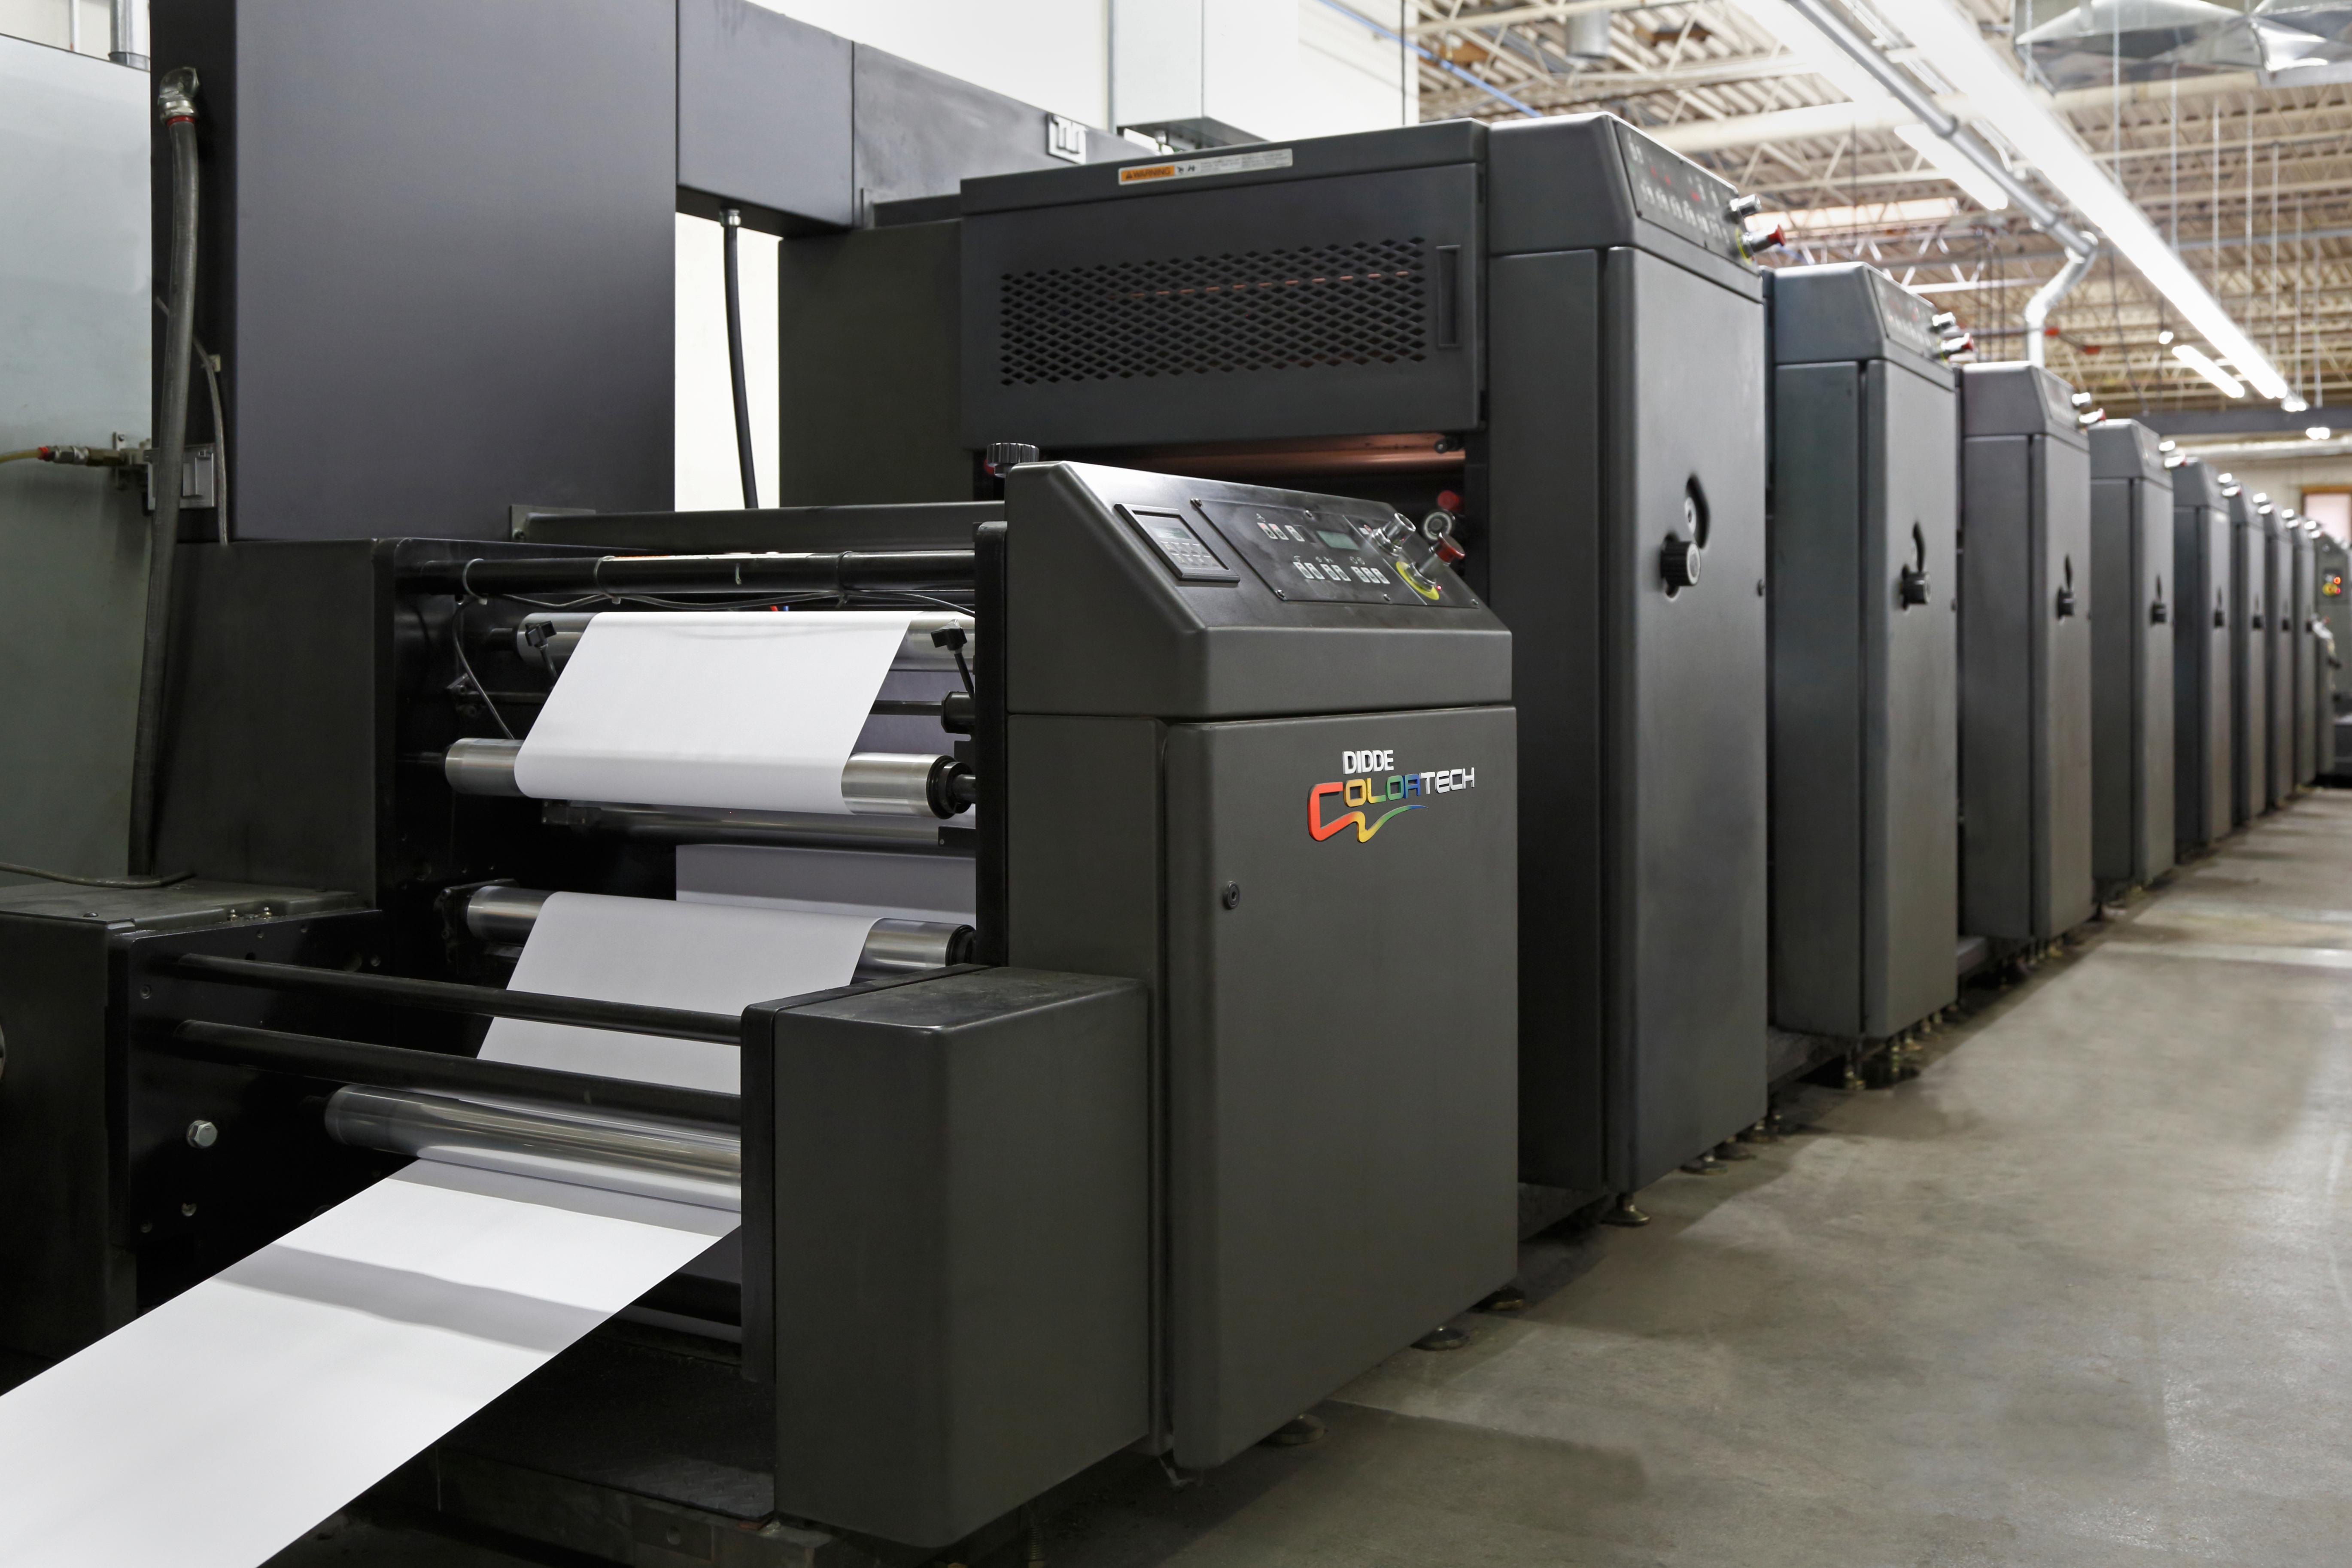 Envelopes and Web Printing